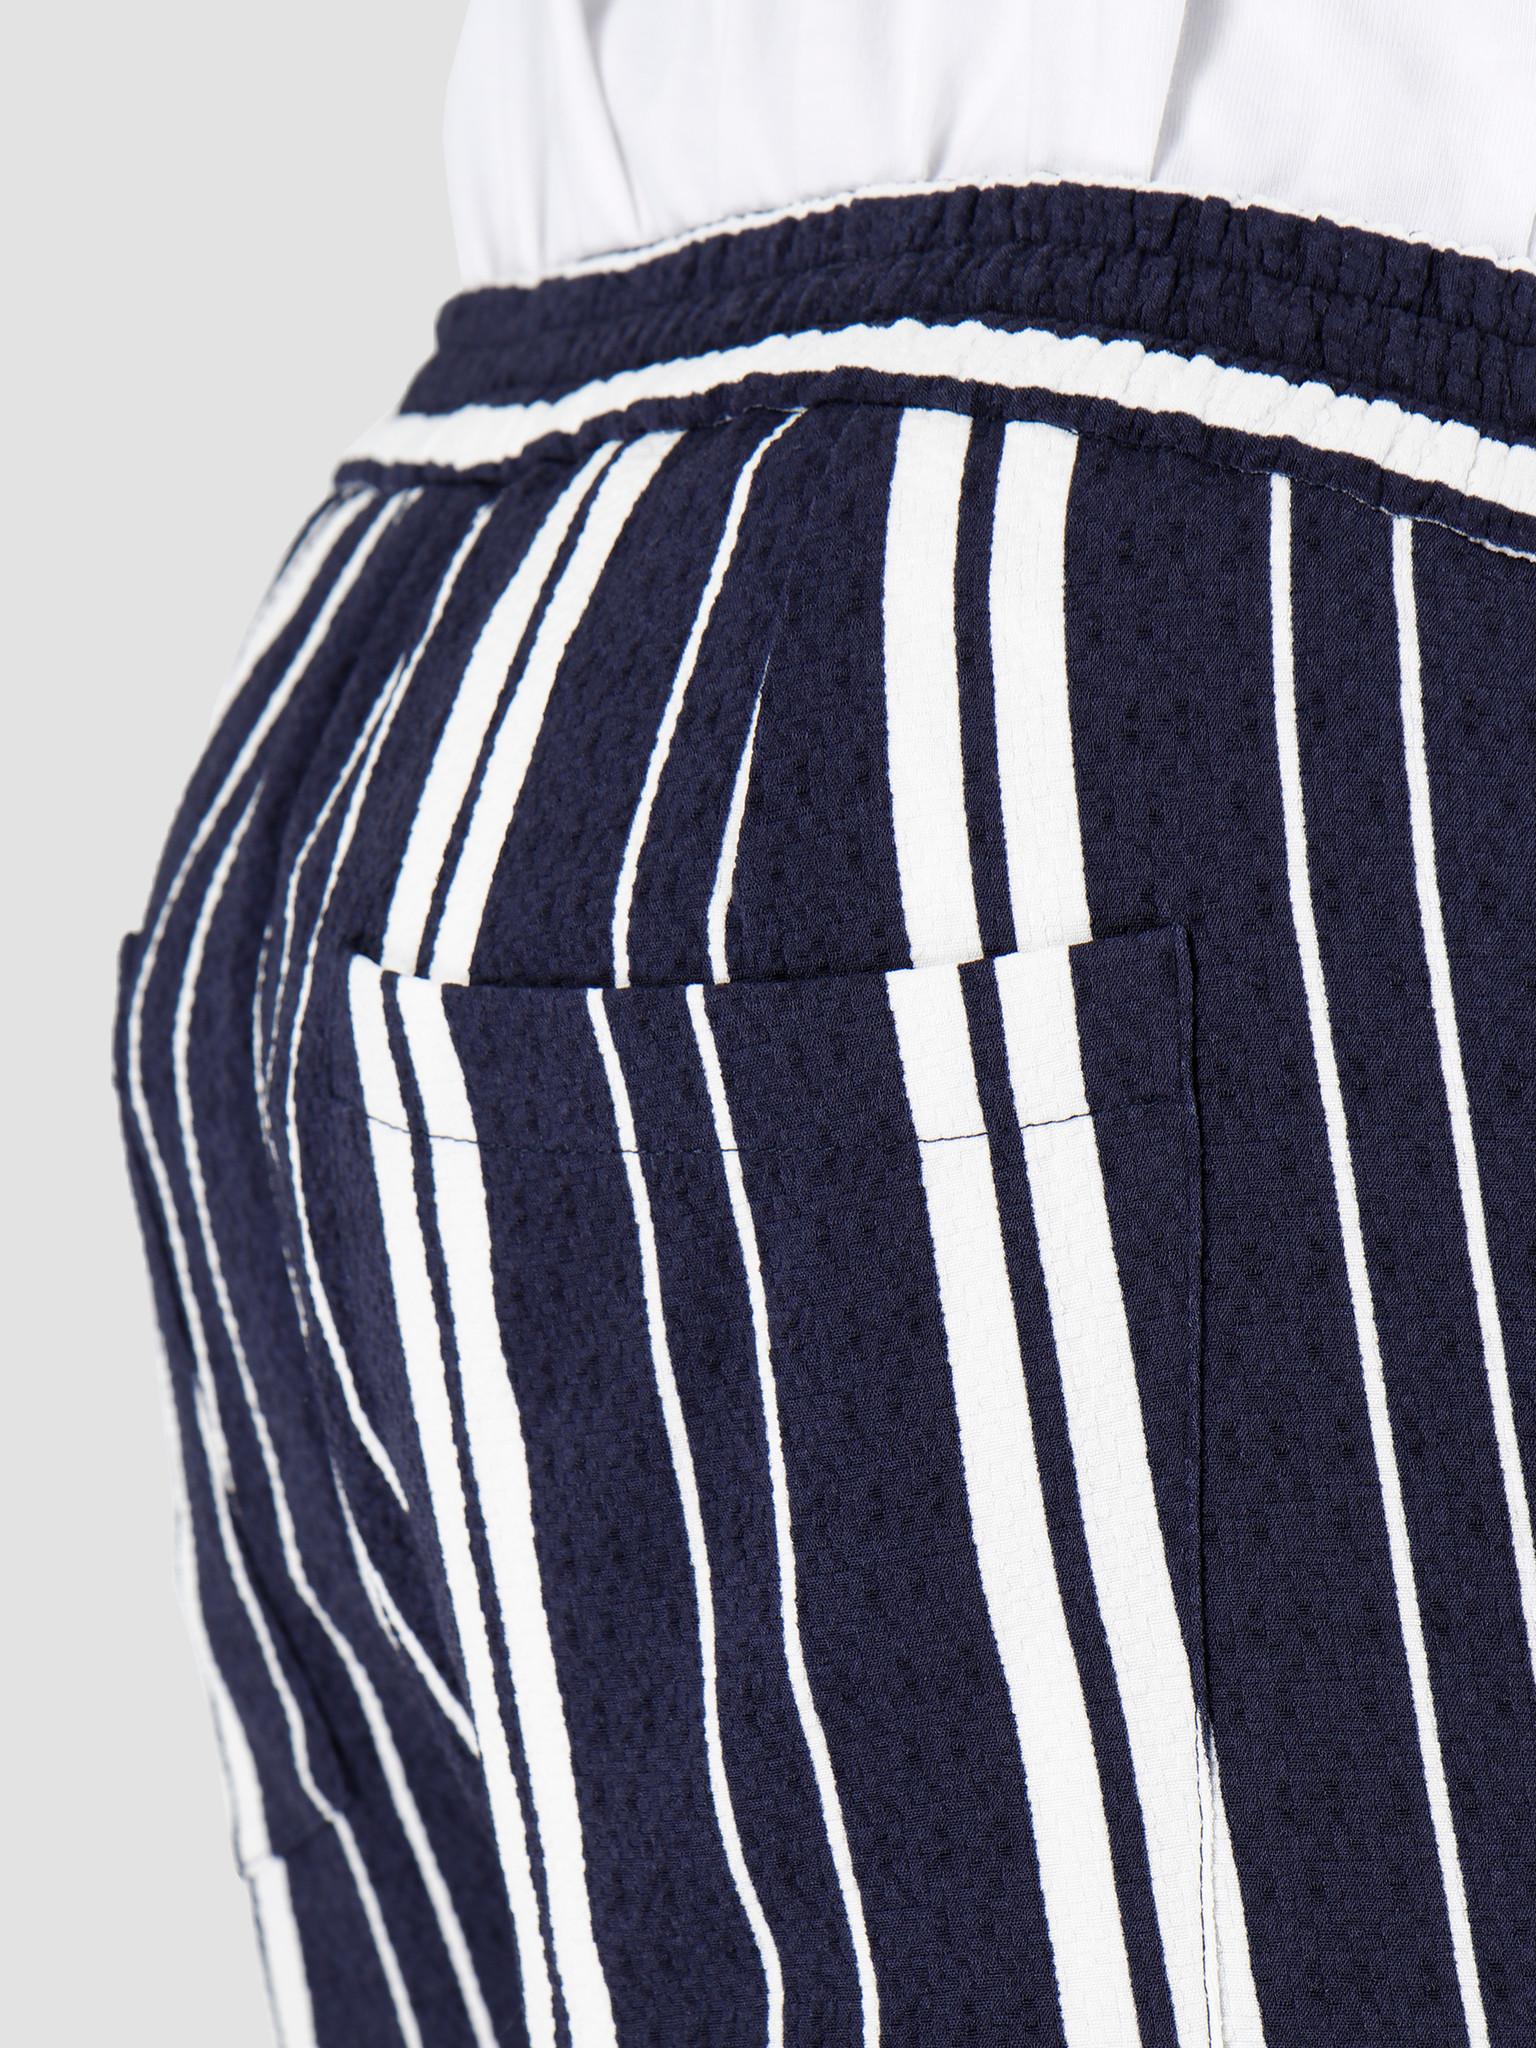 Libertine Libertine Libertine Libertine Front Shorts Off White W Navy Stripe 1621